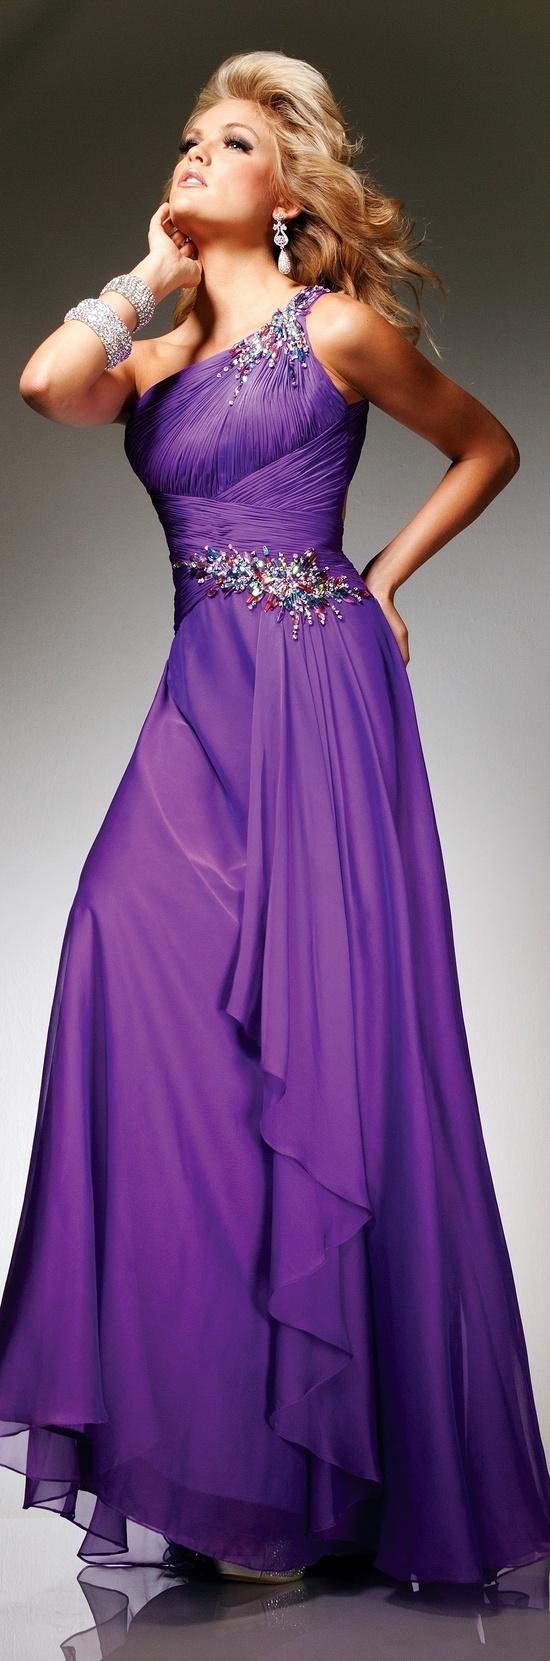 Purple dress purple pinterest prom night purple dress and